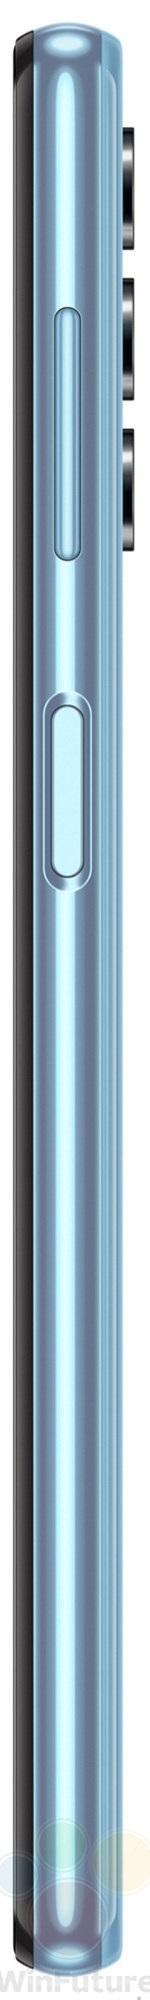 Samsung Galaxy A32: самый доступный смартфон от Samsung с 5G. Фото Samsung  - galaxy_a32_samyj_dostupnyj_samsung_s_5g_bez_bloka_pod_kameru_na_foto_8